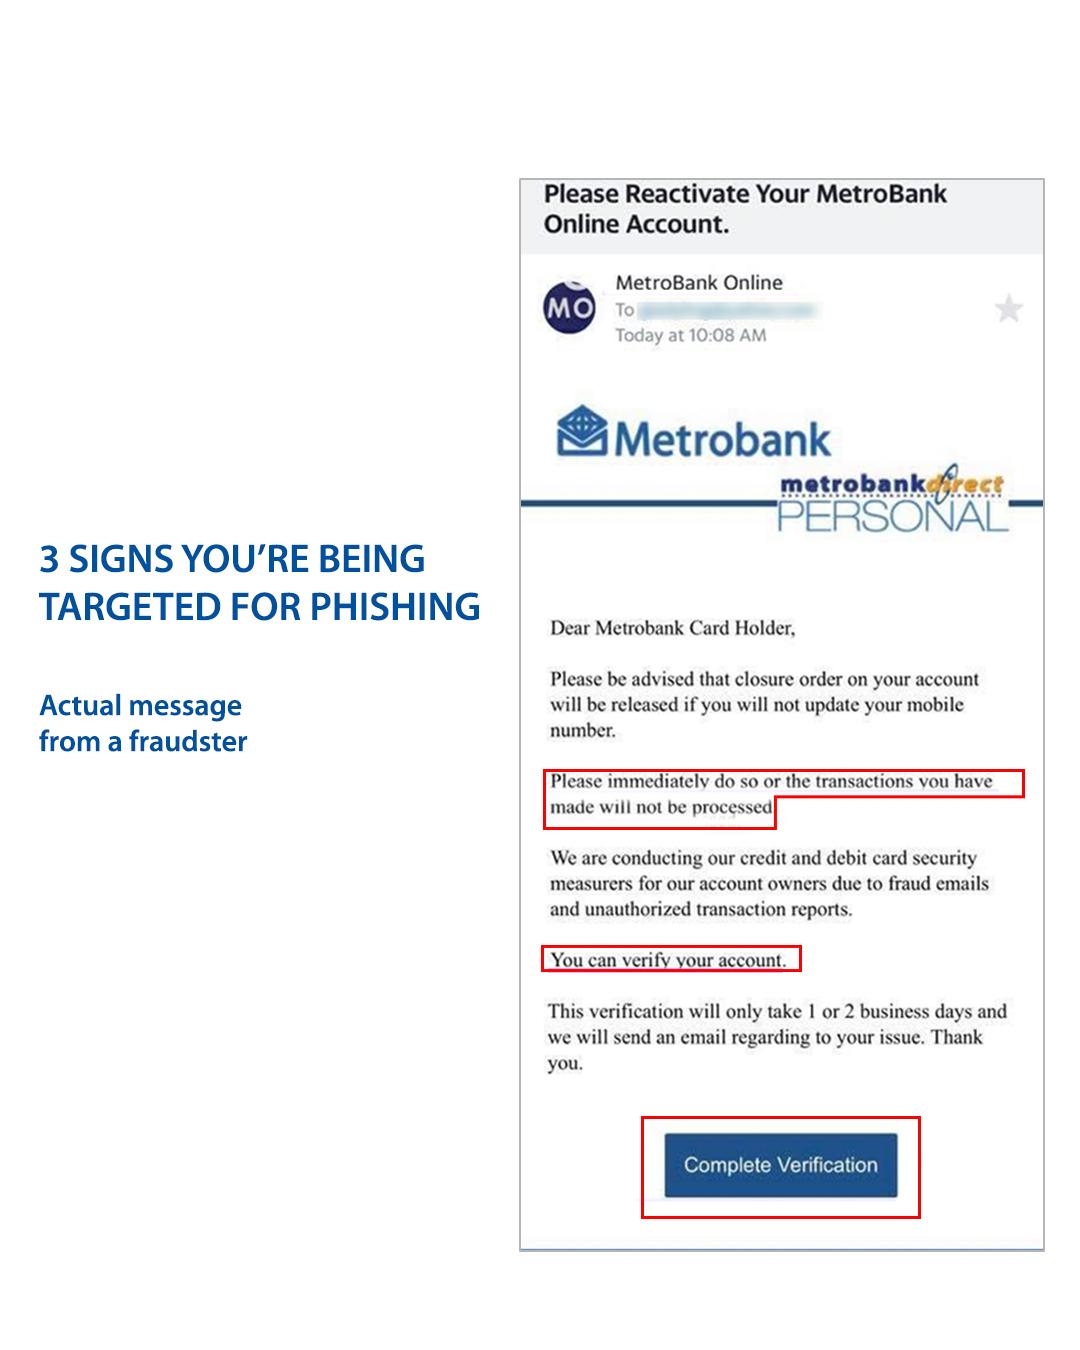 Actual screenshot of a phishing email